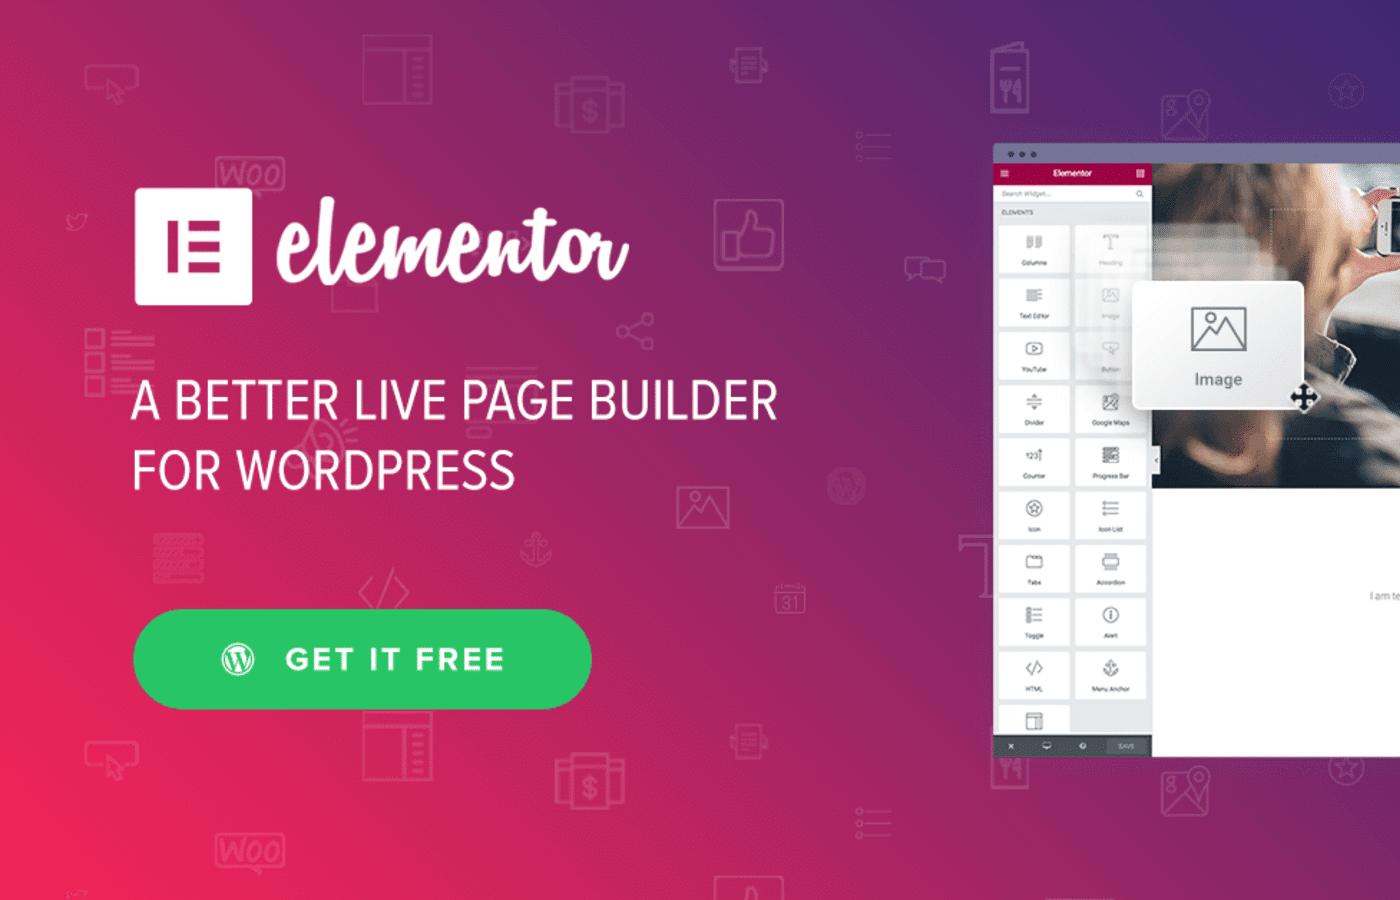 elementor Page Builder wordpress theme download image wp website lab